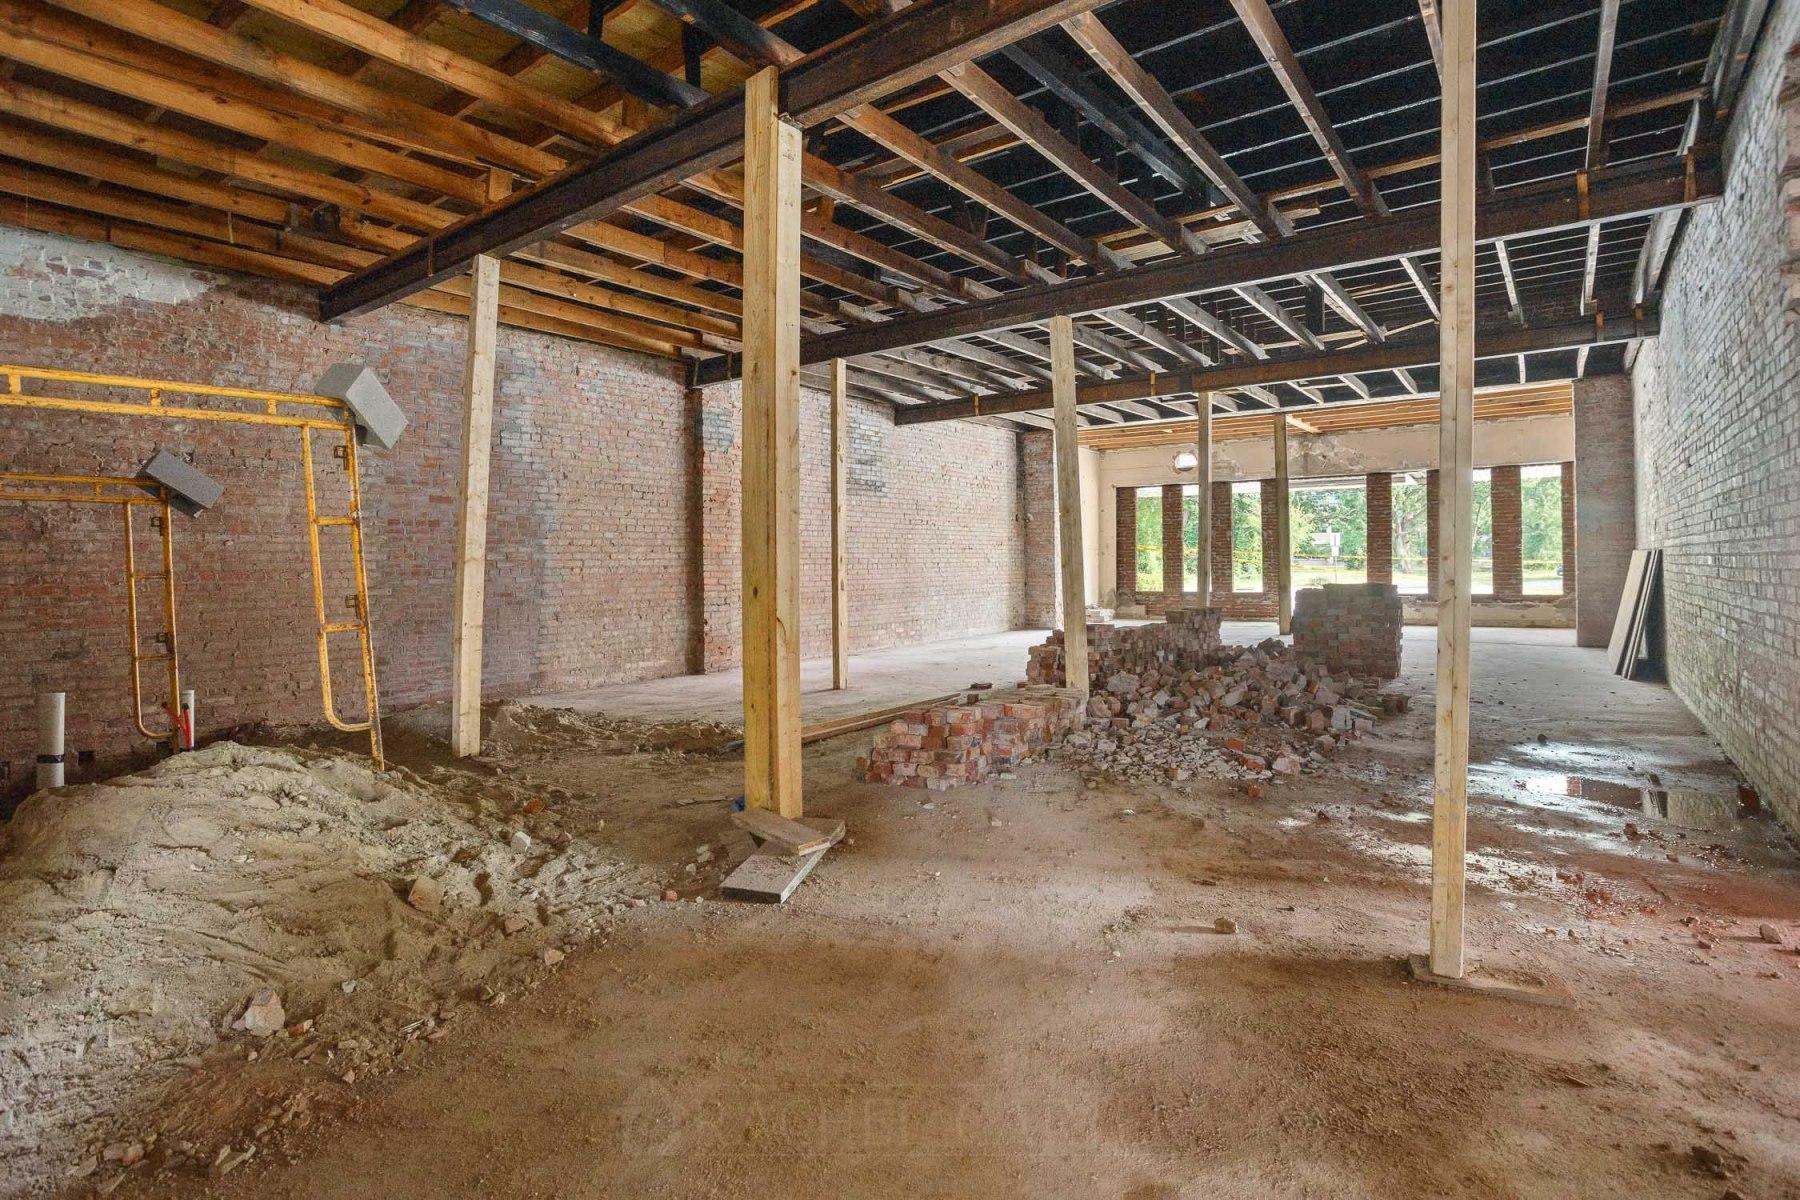 Horizons-East-Office-Renovation-1st-Set-27May2021_SB_01292_web-size